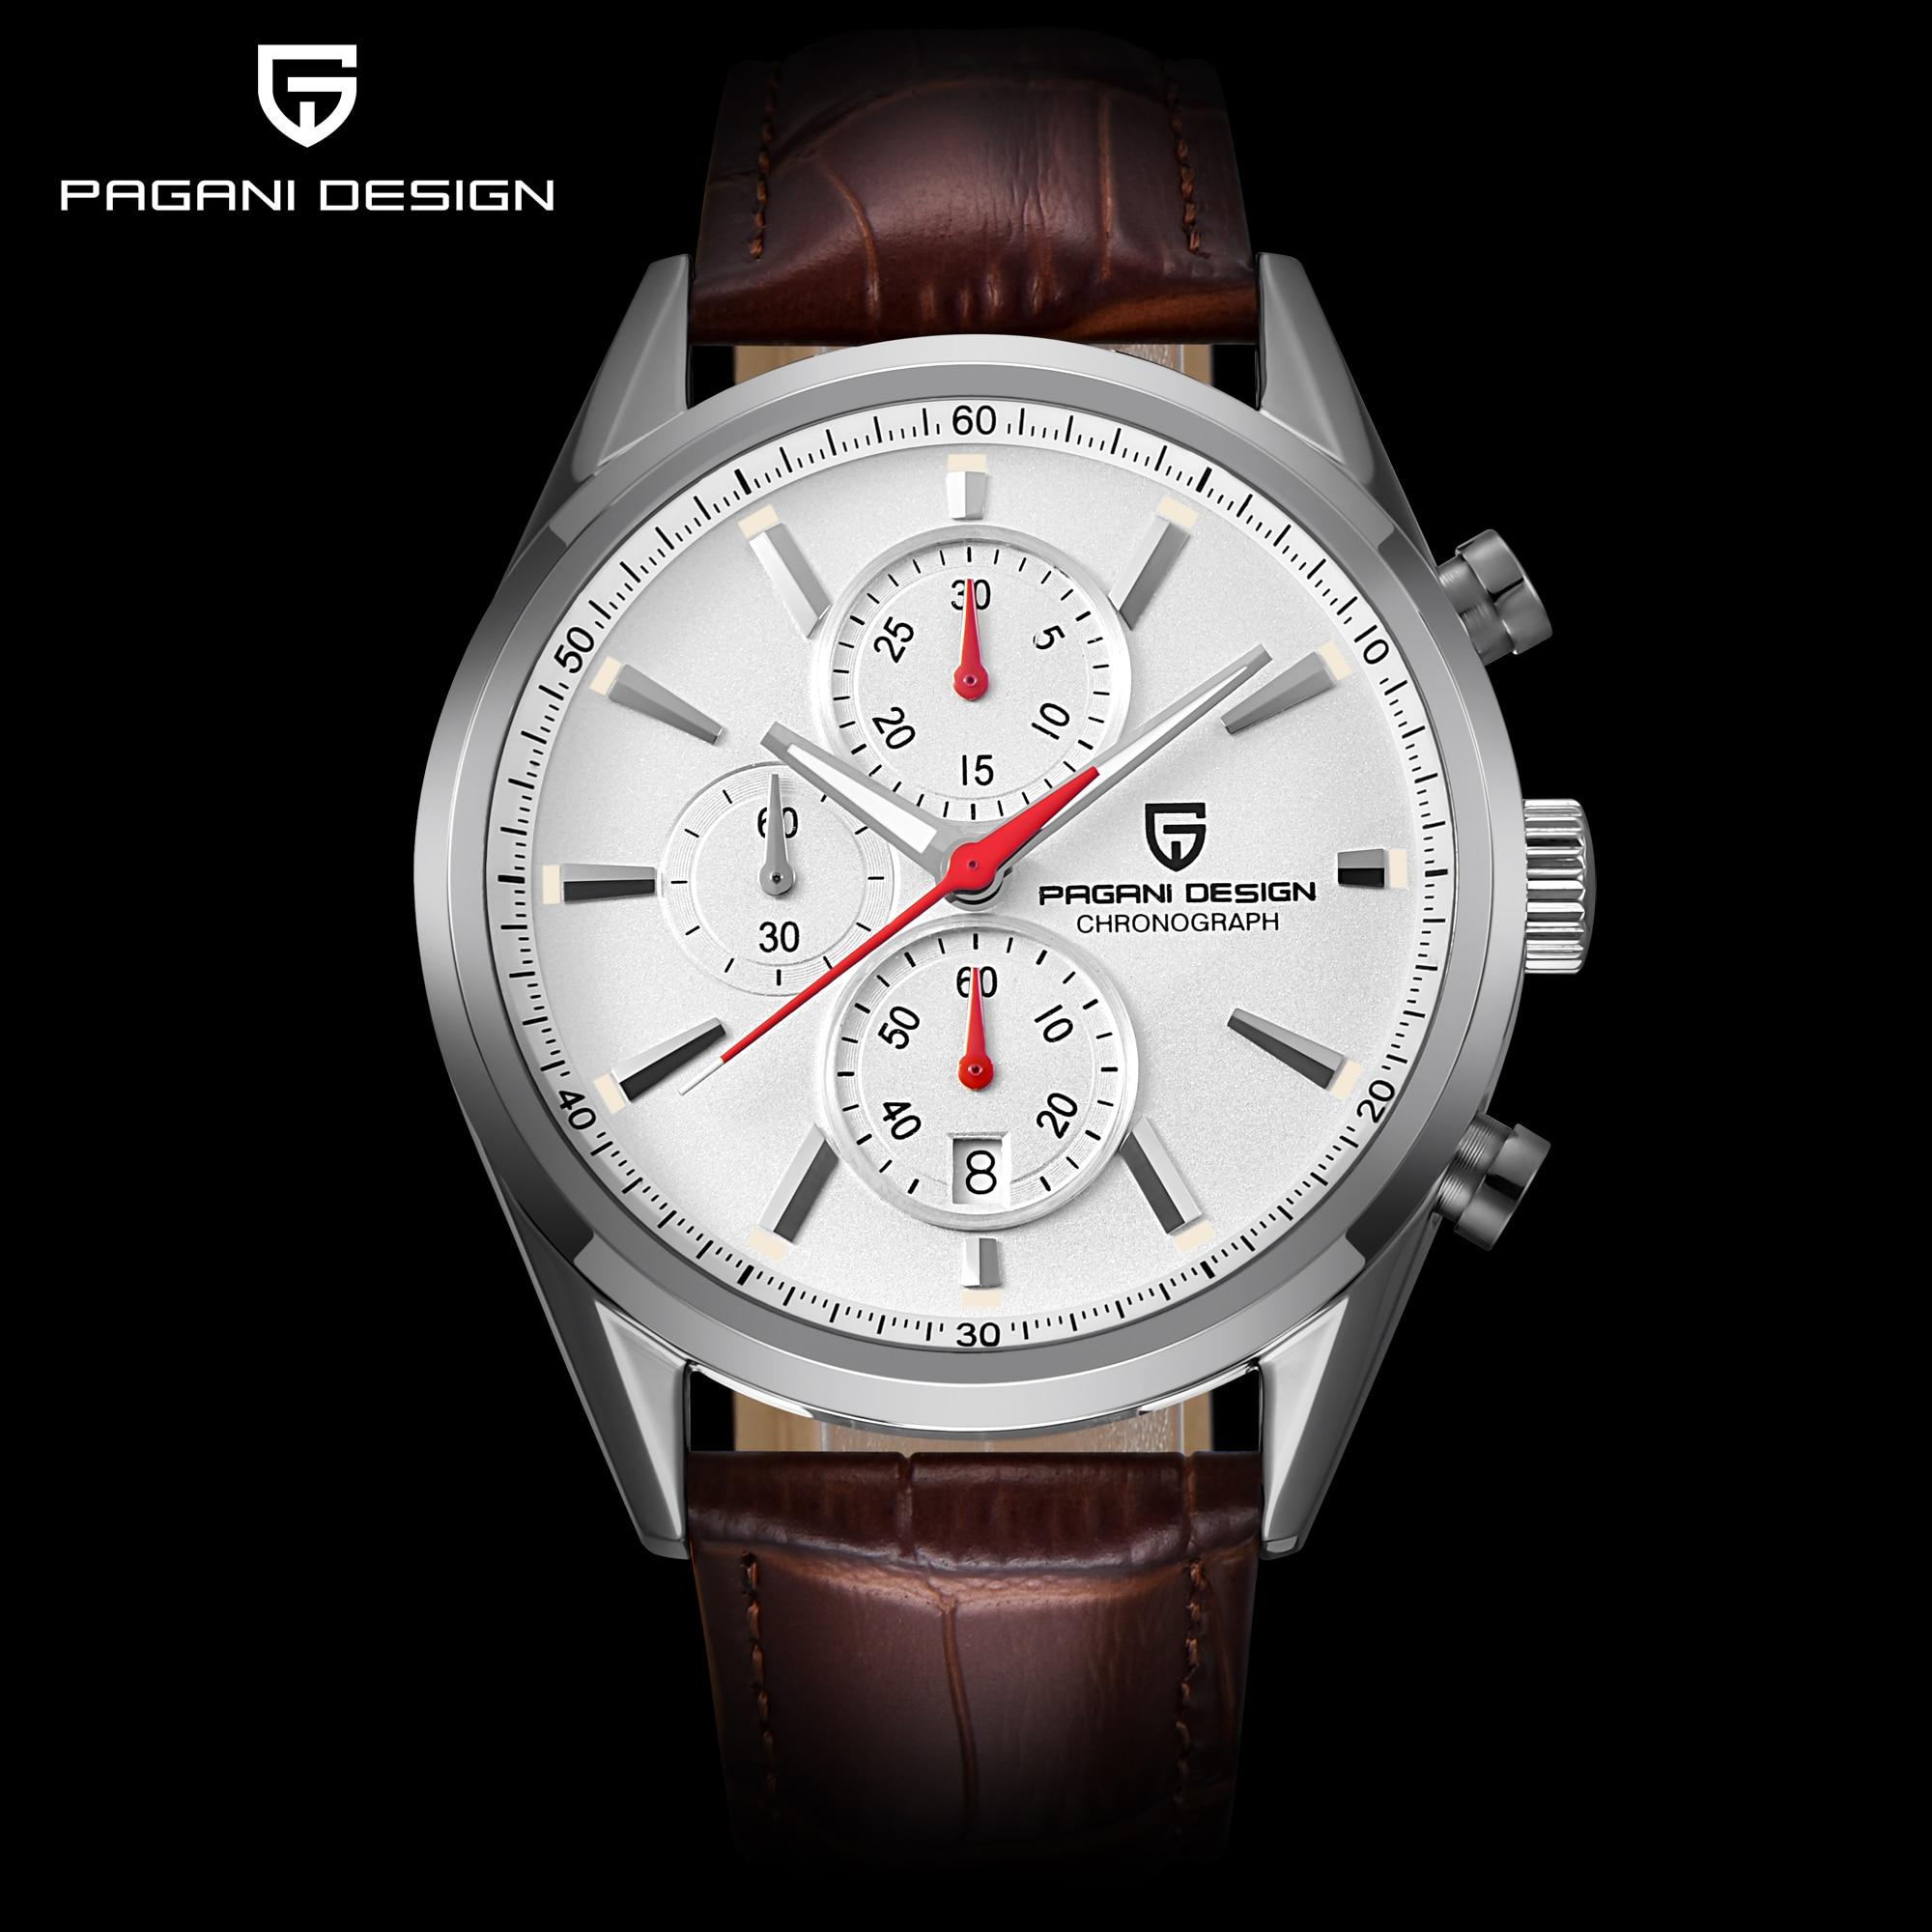 PAGANI עיצוב Mens שעונים למעלה מותג יוקרה נירוסטה ספורט שעון קוורץ זכר שעוני יד גברים שעון relogio masculino